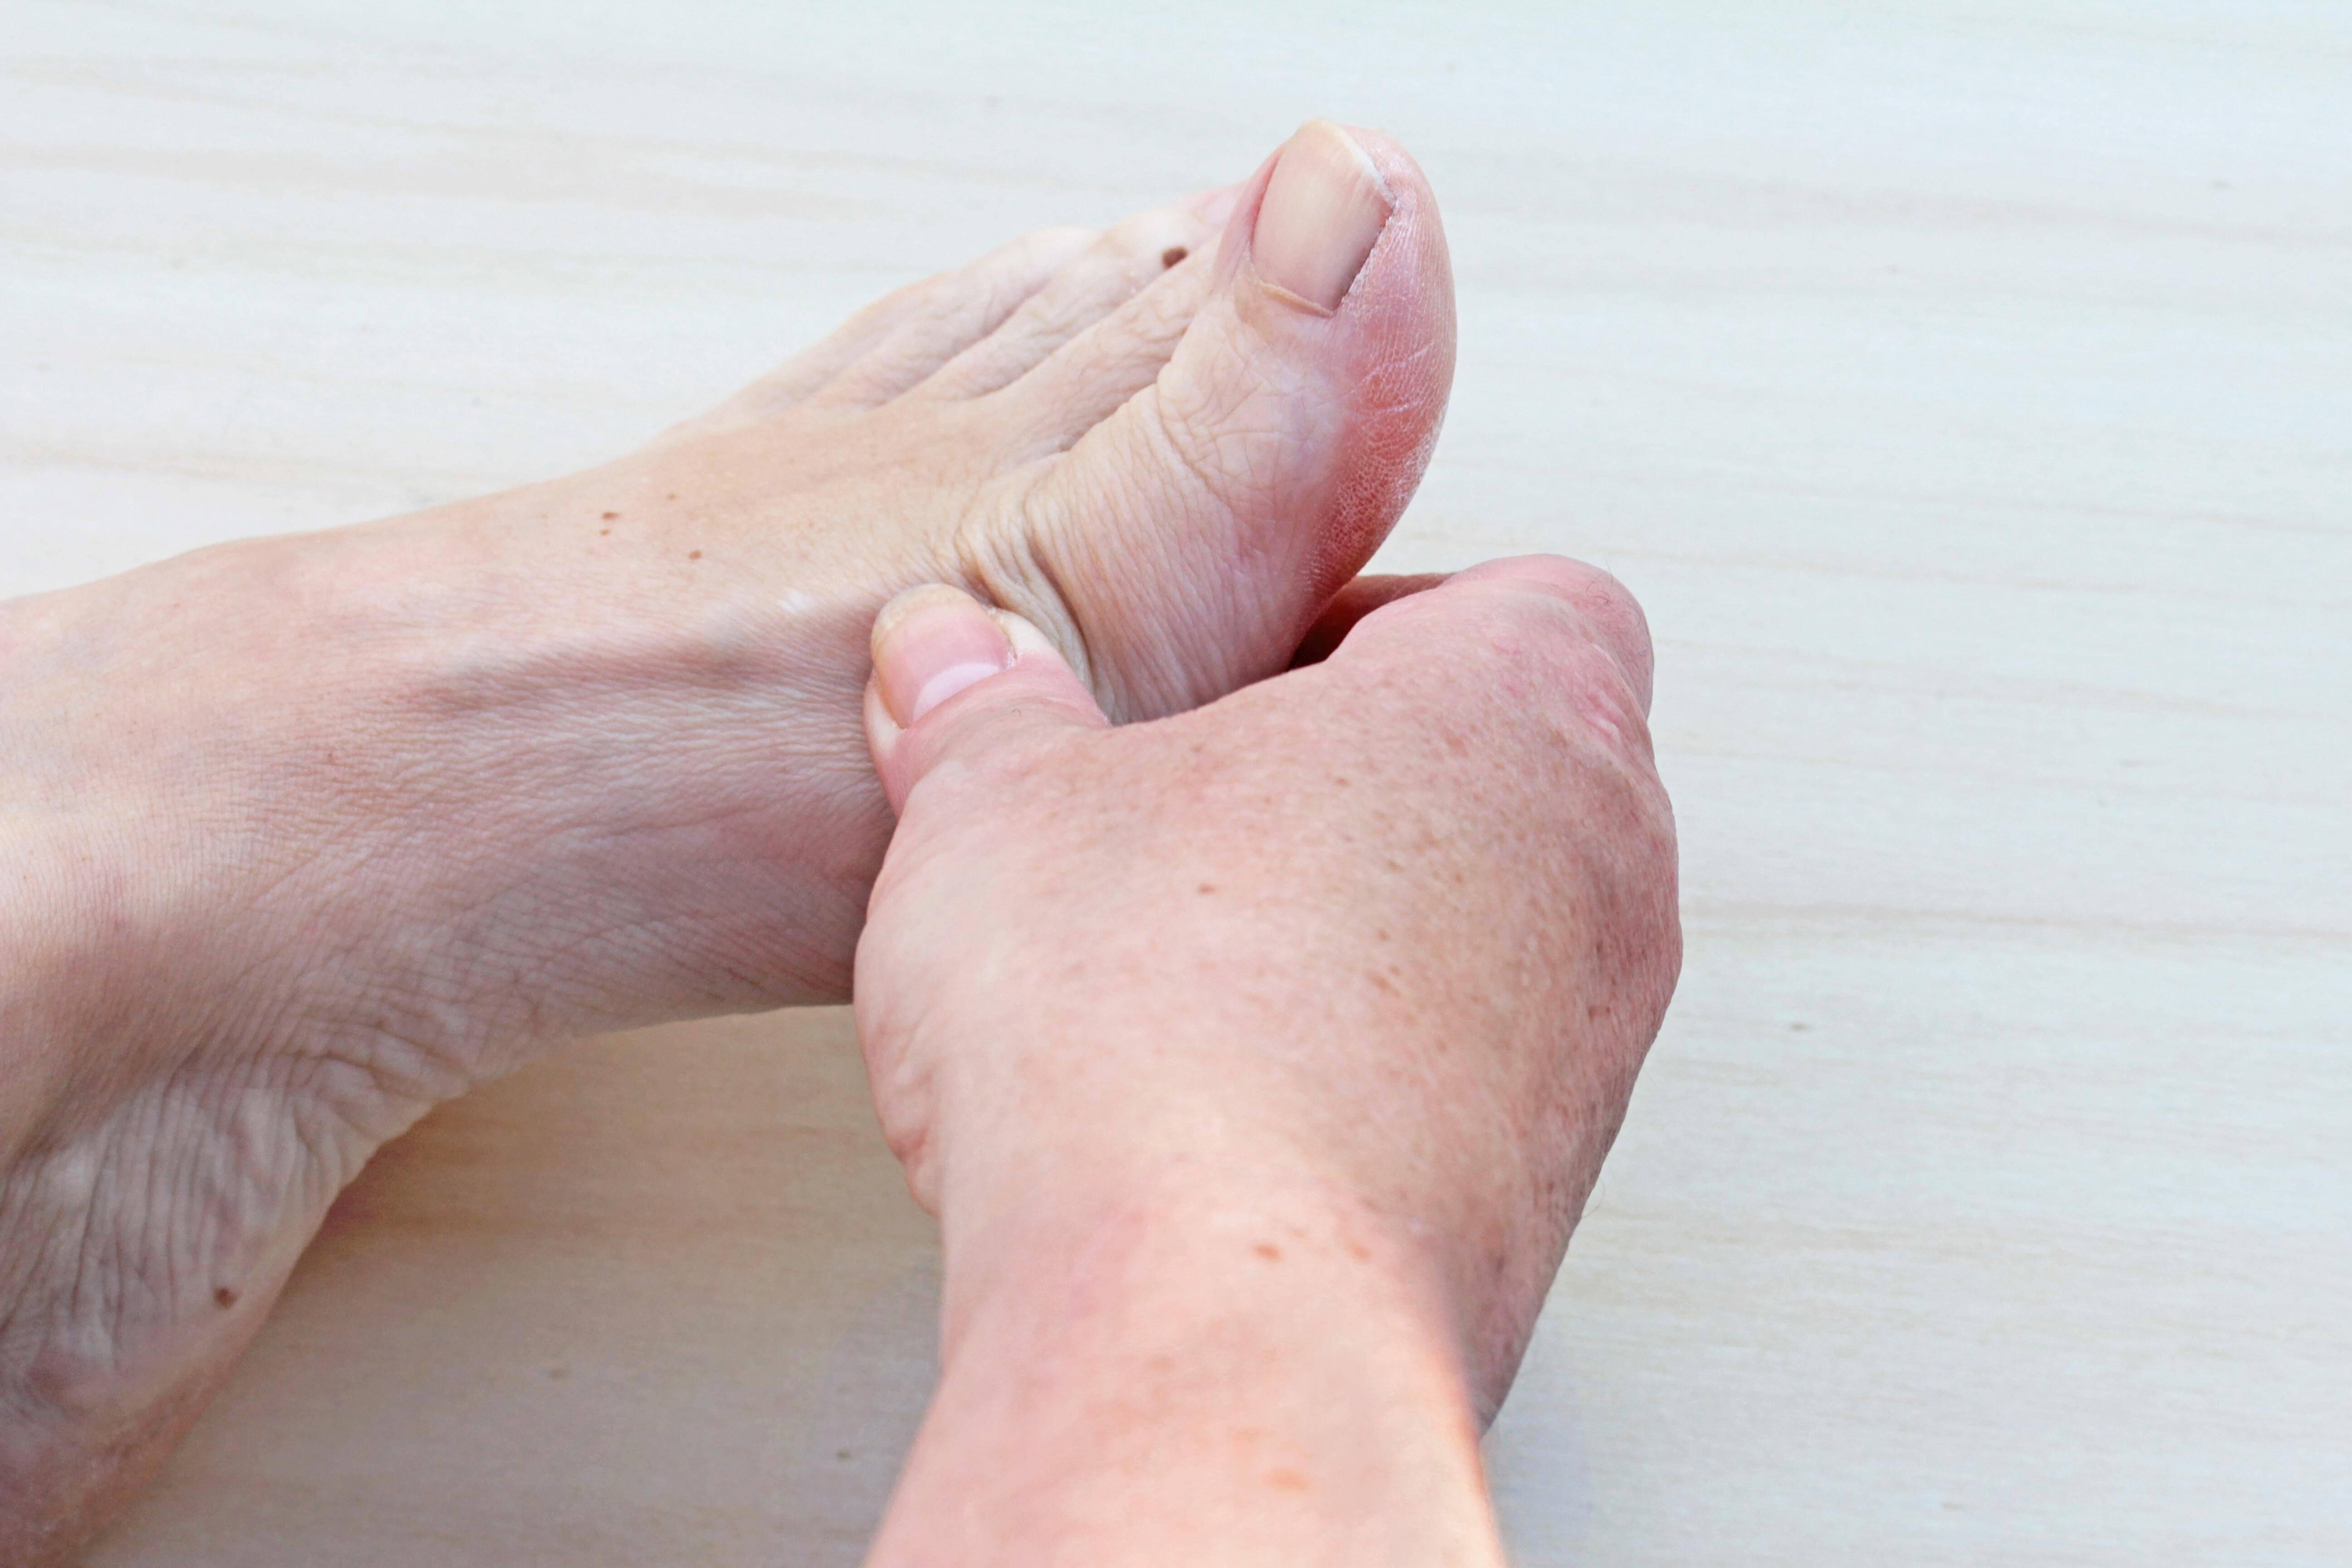 Entzündung zeh Nagelbettentzündung: Symptome